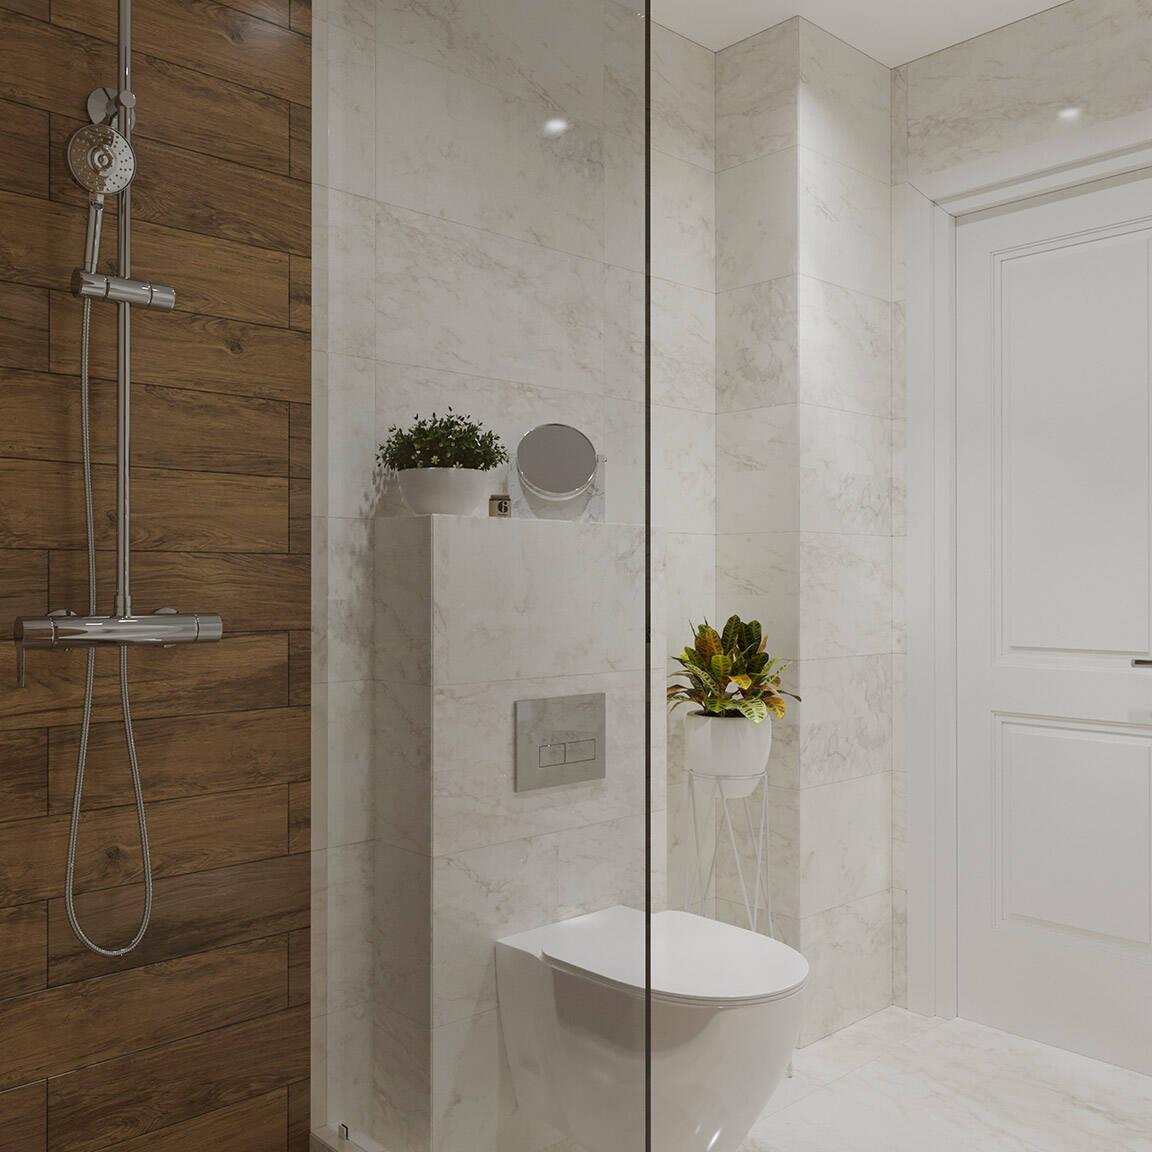 Catedral Residence - Bathroom - Marazzi Ceramic tiles - 8